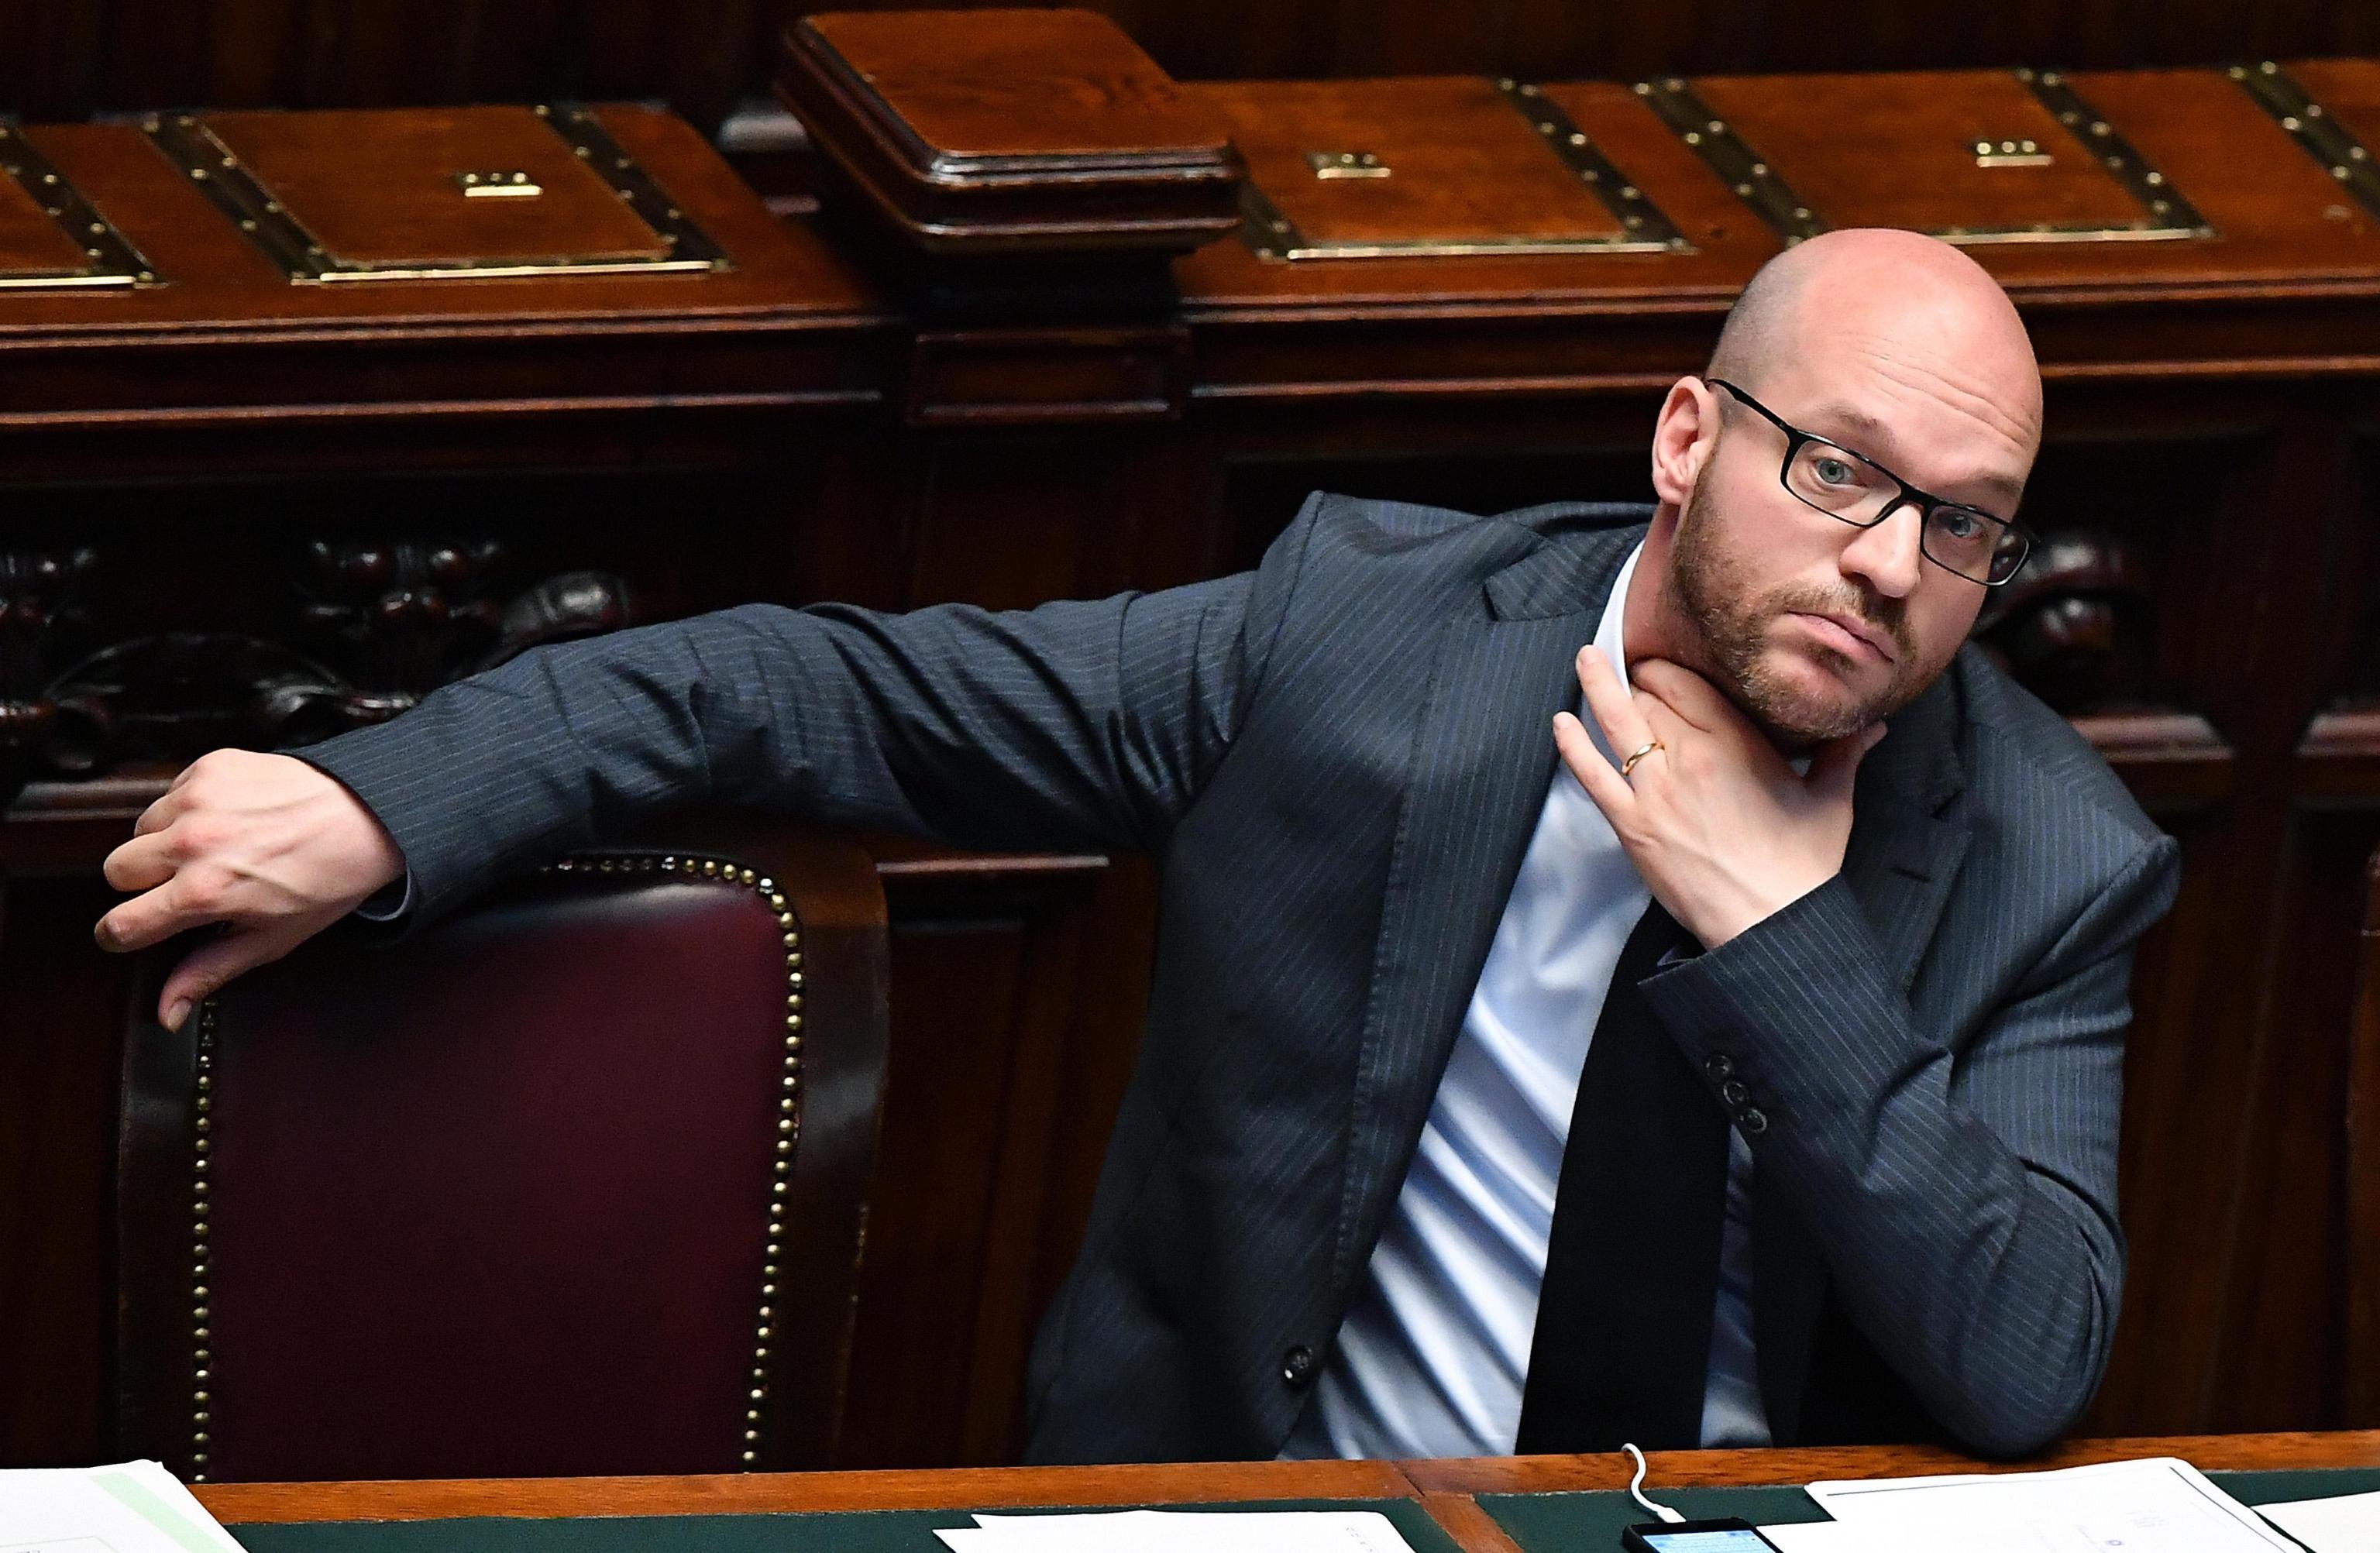 Razzismo: ministro Fontana, abolire legge Mancino